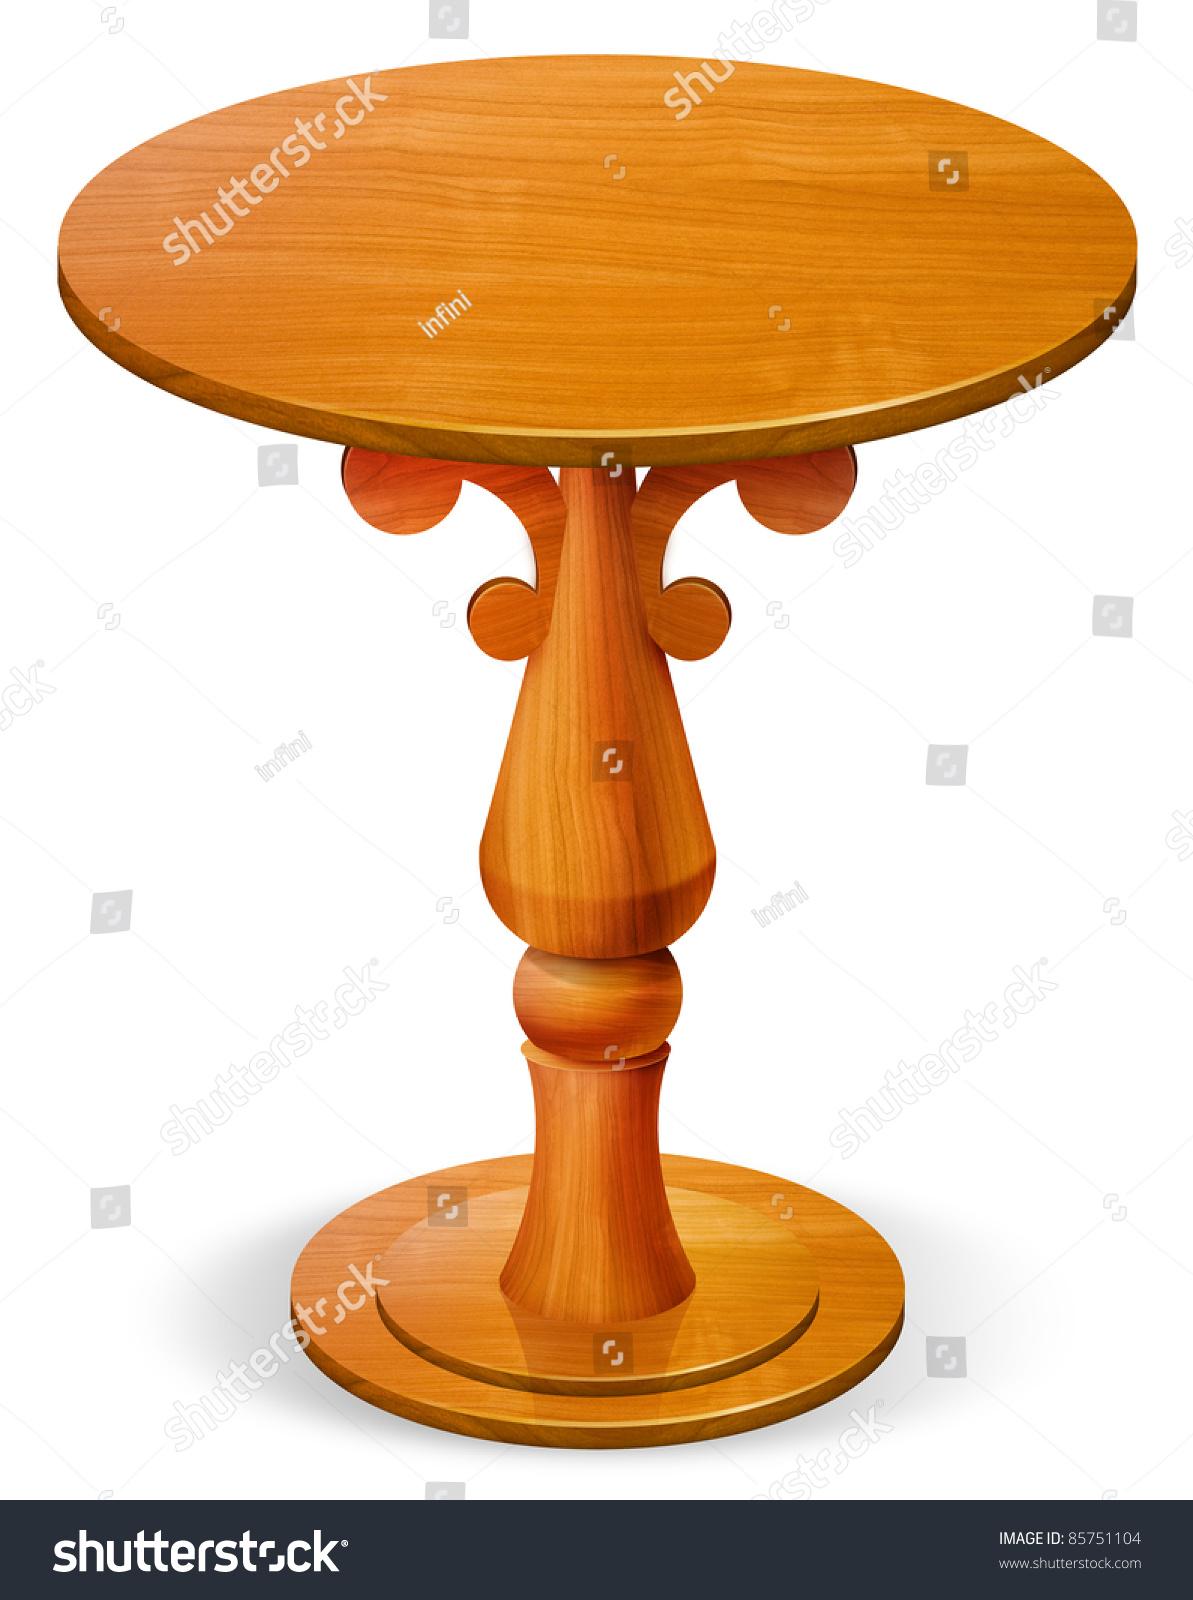 Wooden Circle Table Stock Illustration 85751104 - Shutterstock